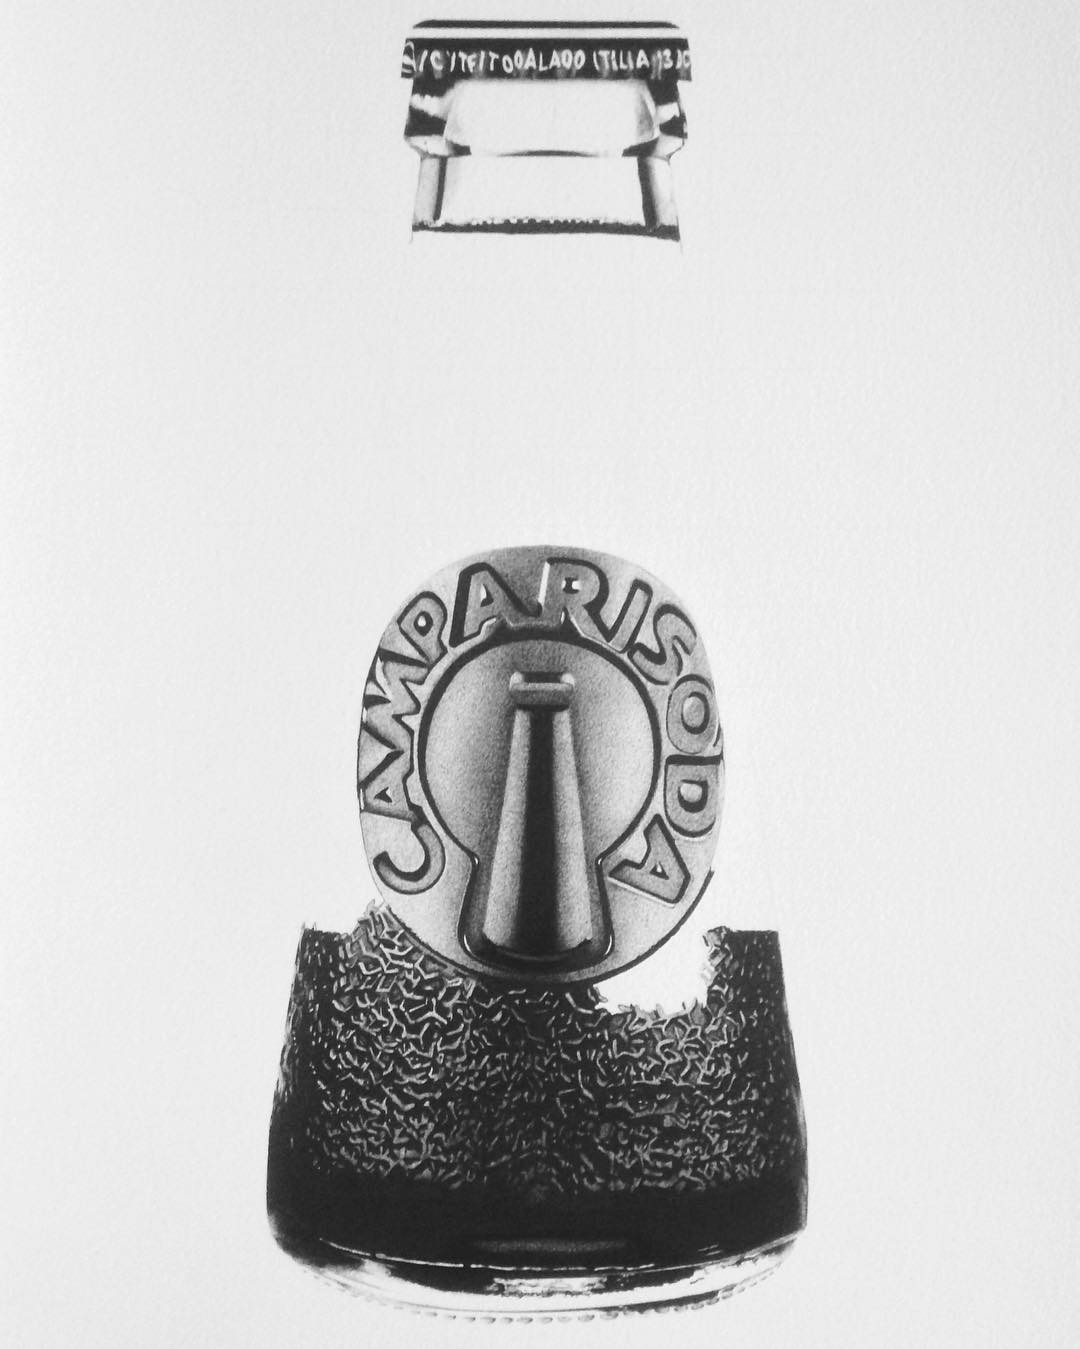 Гиперреализм в картинах Алессандро Паглия